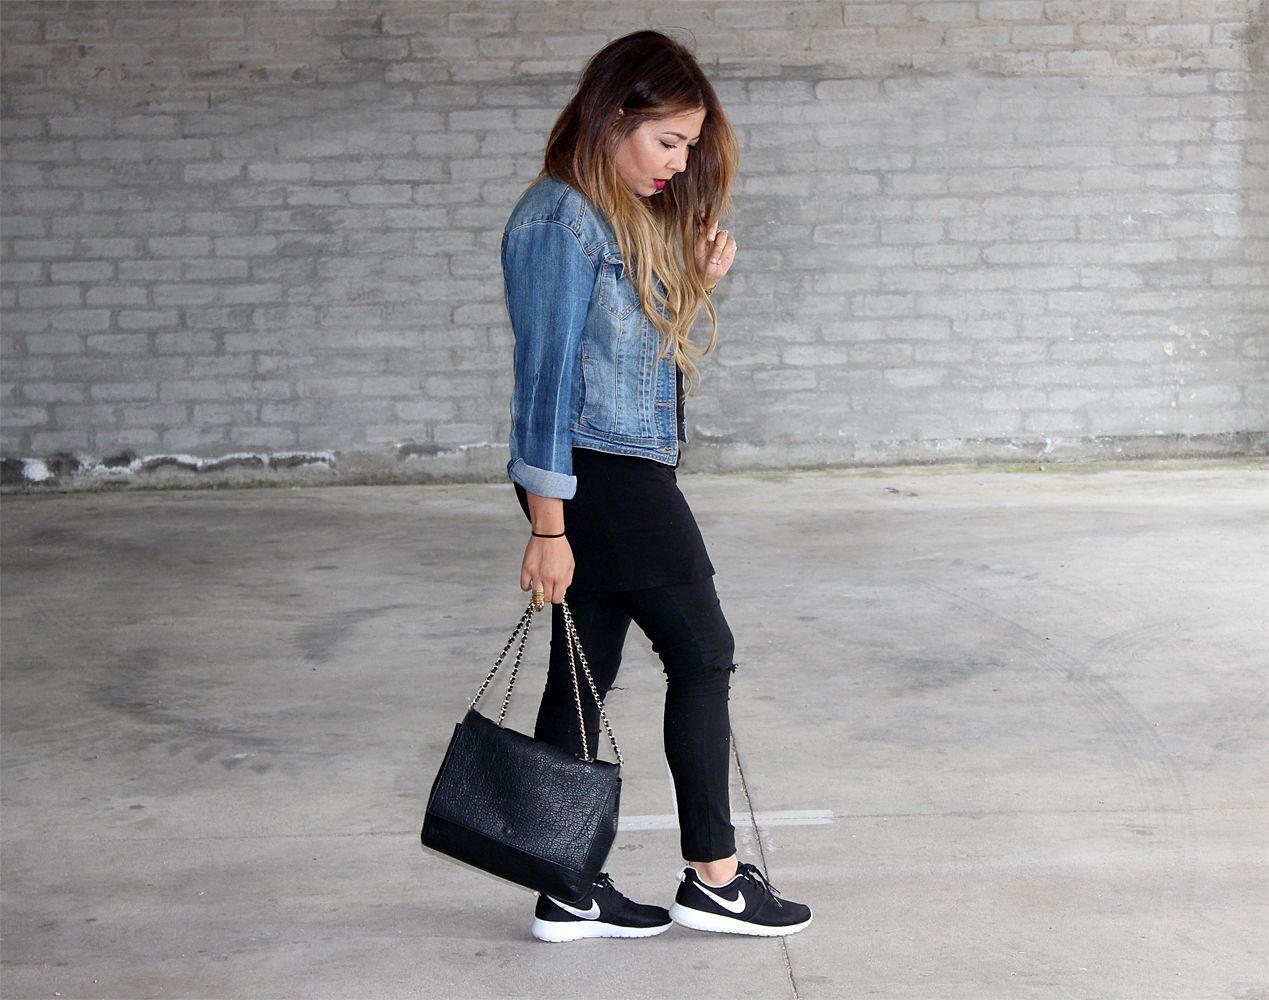 1ce80eb6b9b1 nike roshe run-Black ripped jeans Denim Jacket. Simple and Chic ...